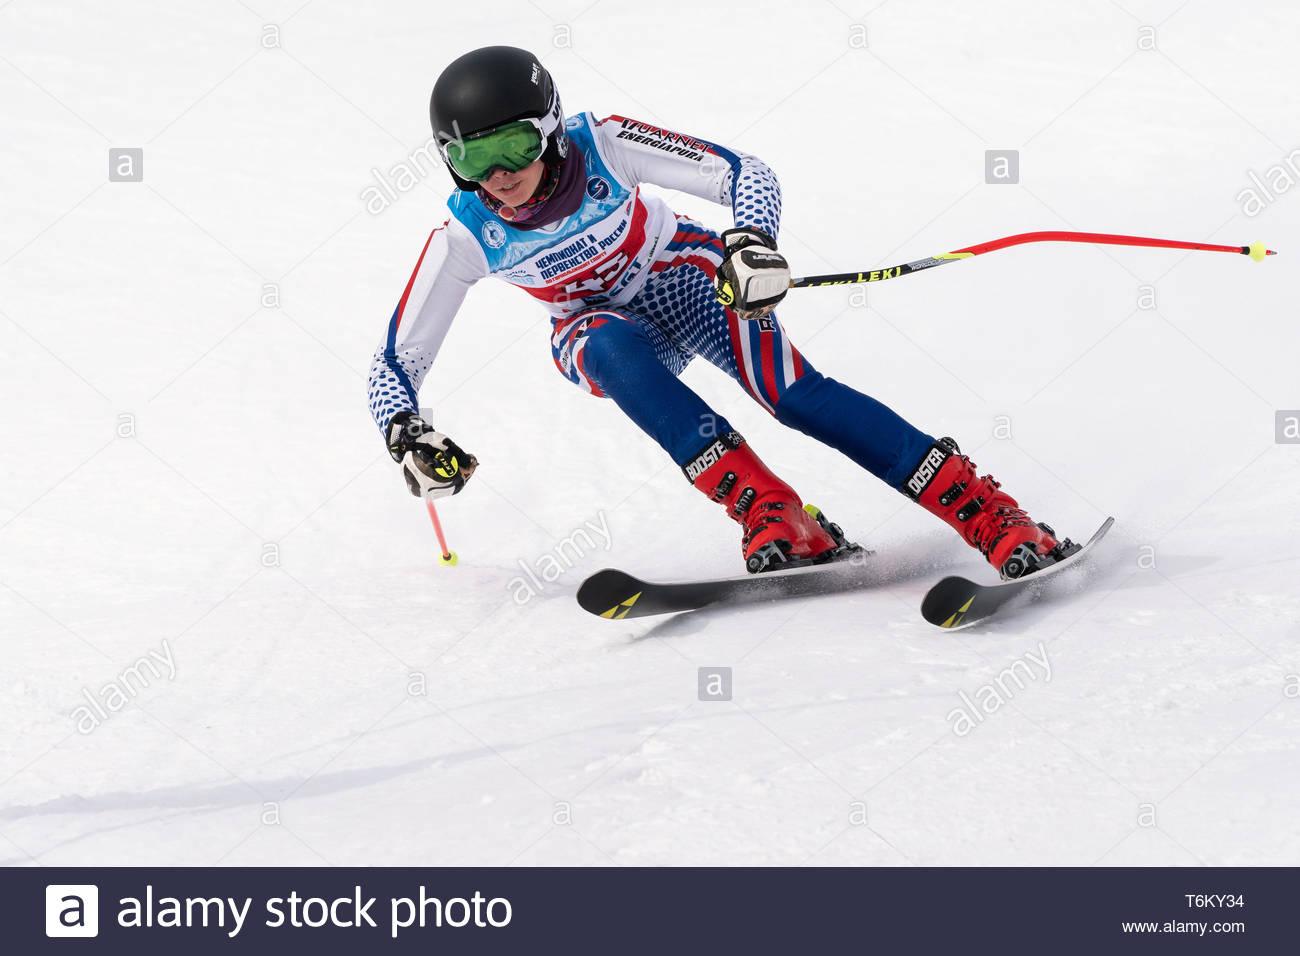 KAMCHATKA, RUSSIA - APR 2, 2019: Mountain skier Anna Martynova (Leningrad Region) skiing down mount slope. Russian Women's Alpine Skiing Cup, Internat - Stock Image